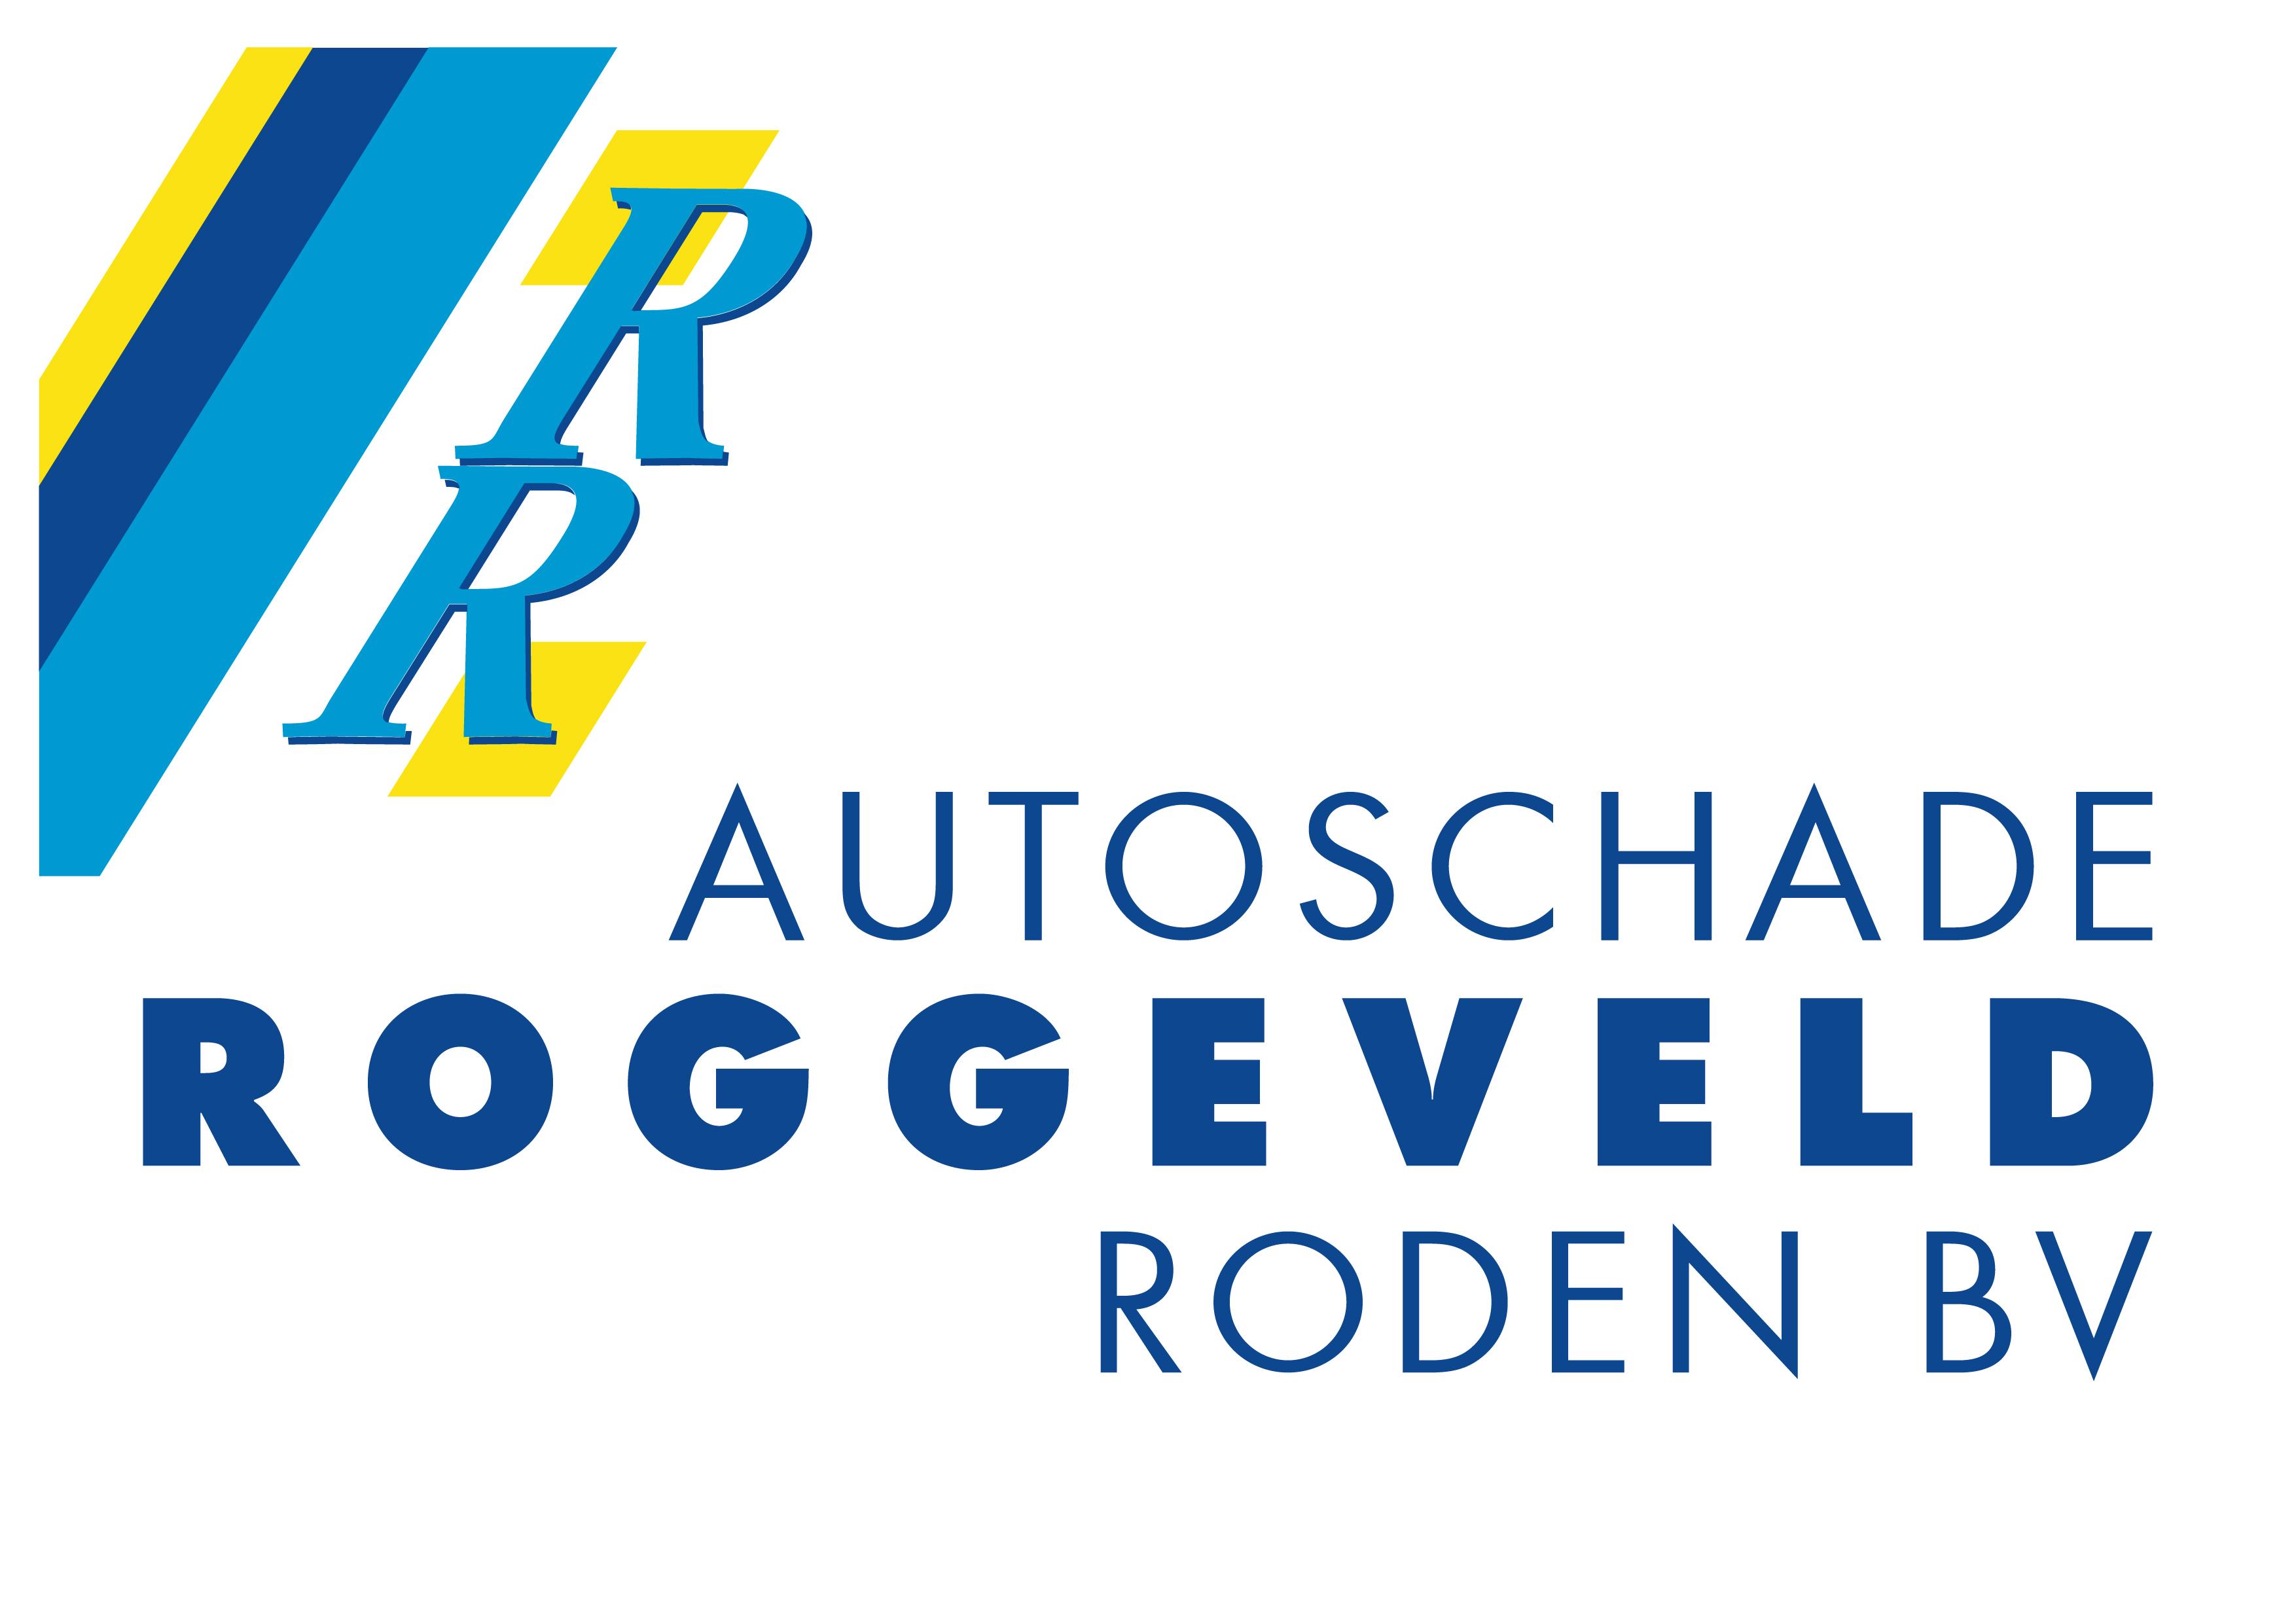 logo-Roggeveld-2012b.cdr